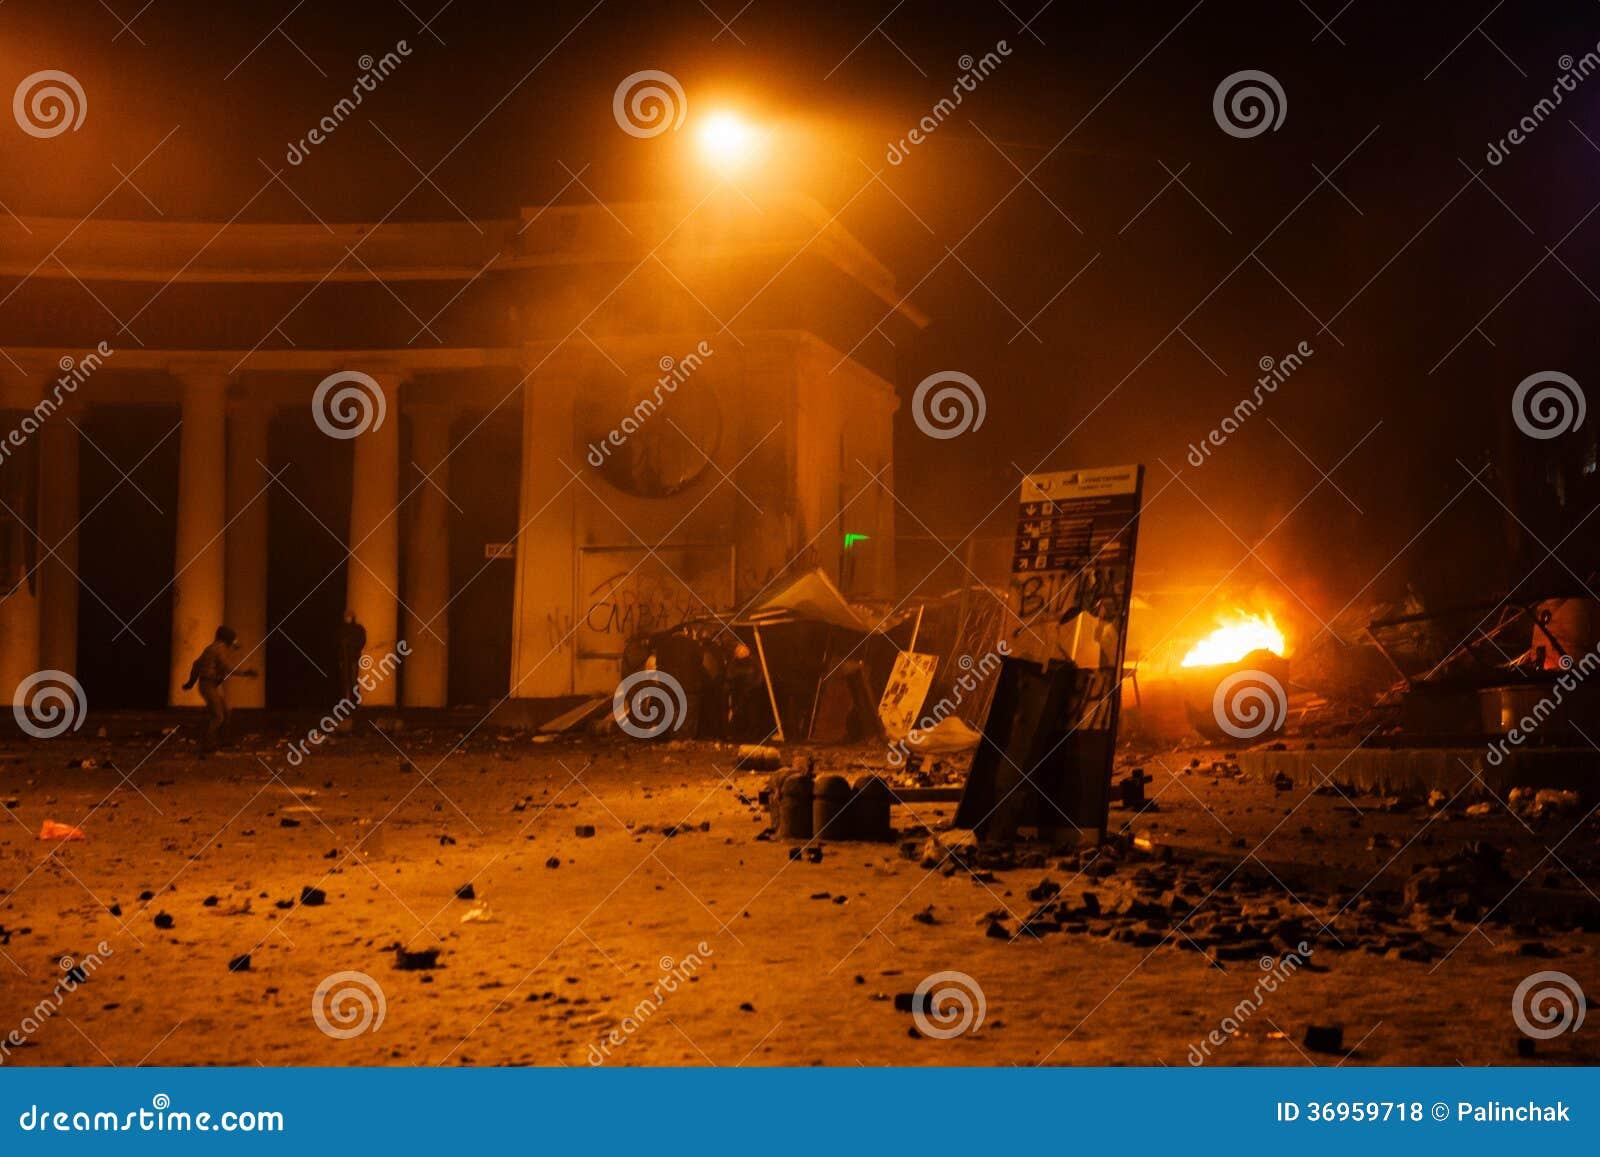 Kiev ukraine january 20 2014 violent confrontation and anti